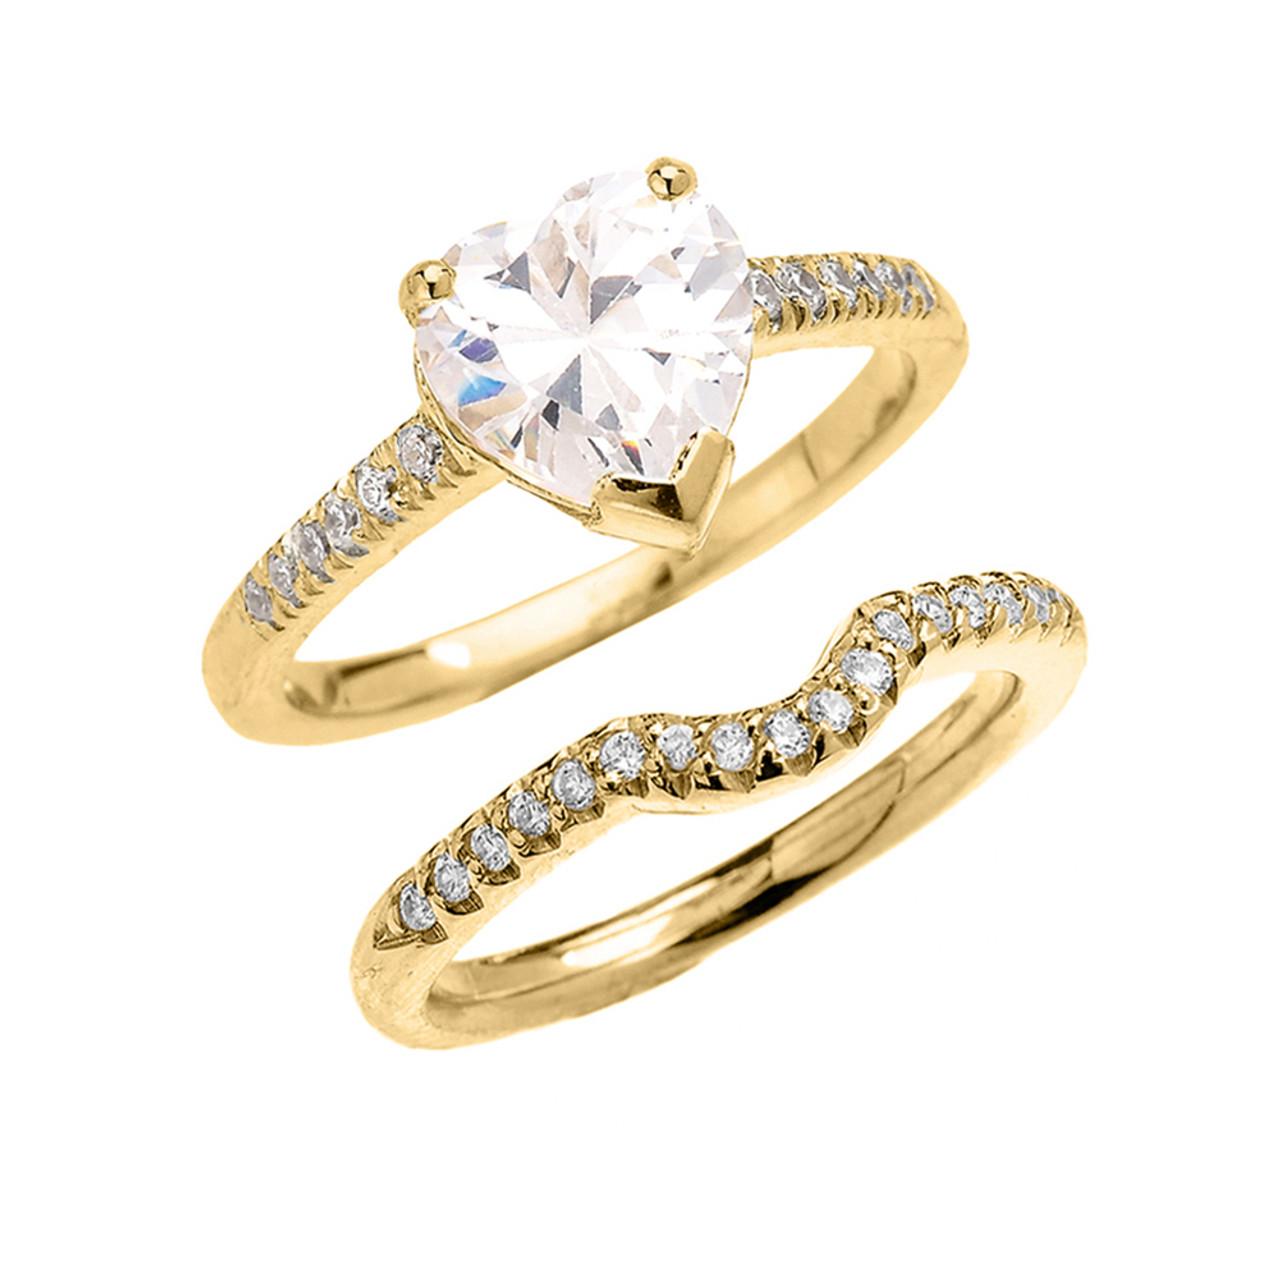 Yellow Gold Dainty Diamond Wedding Ring Set With 3 Carat Heart Shape ...